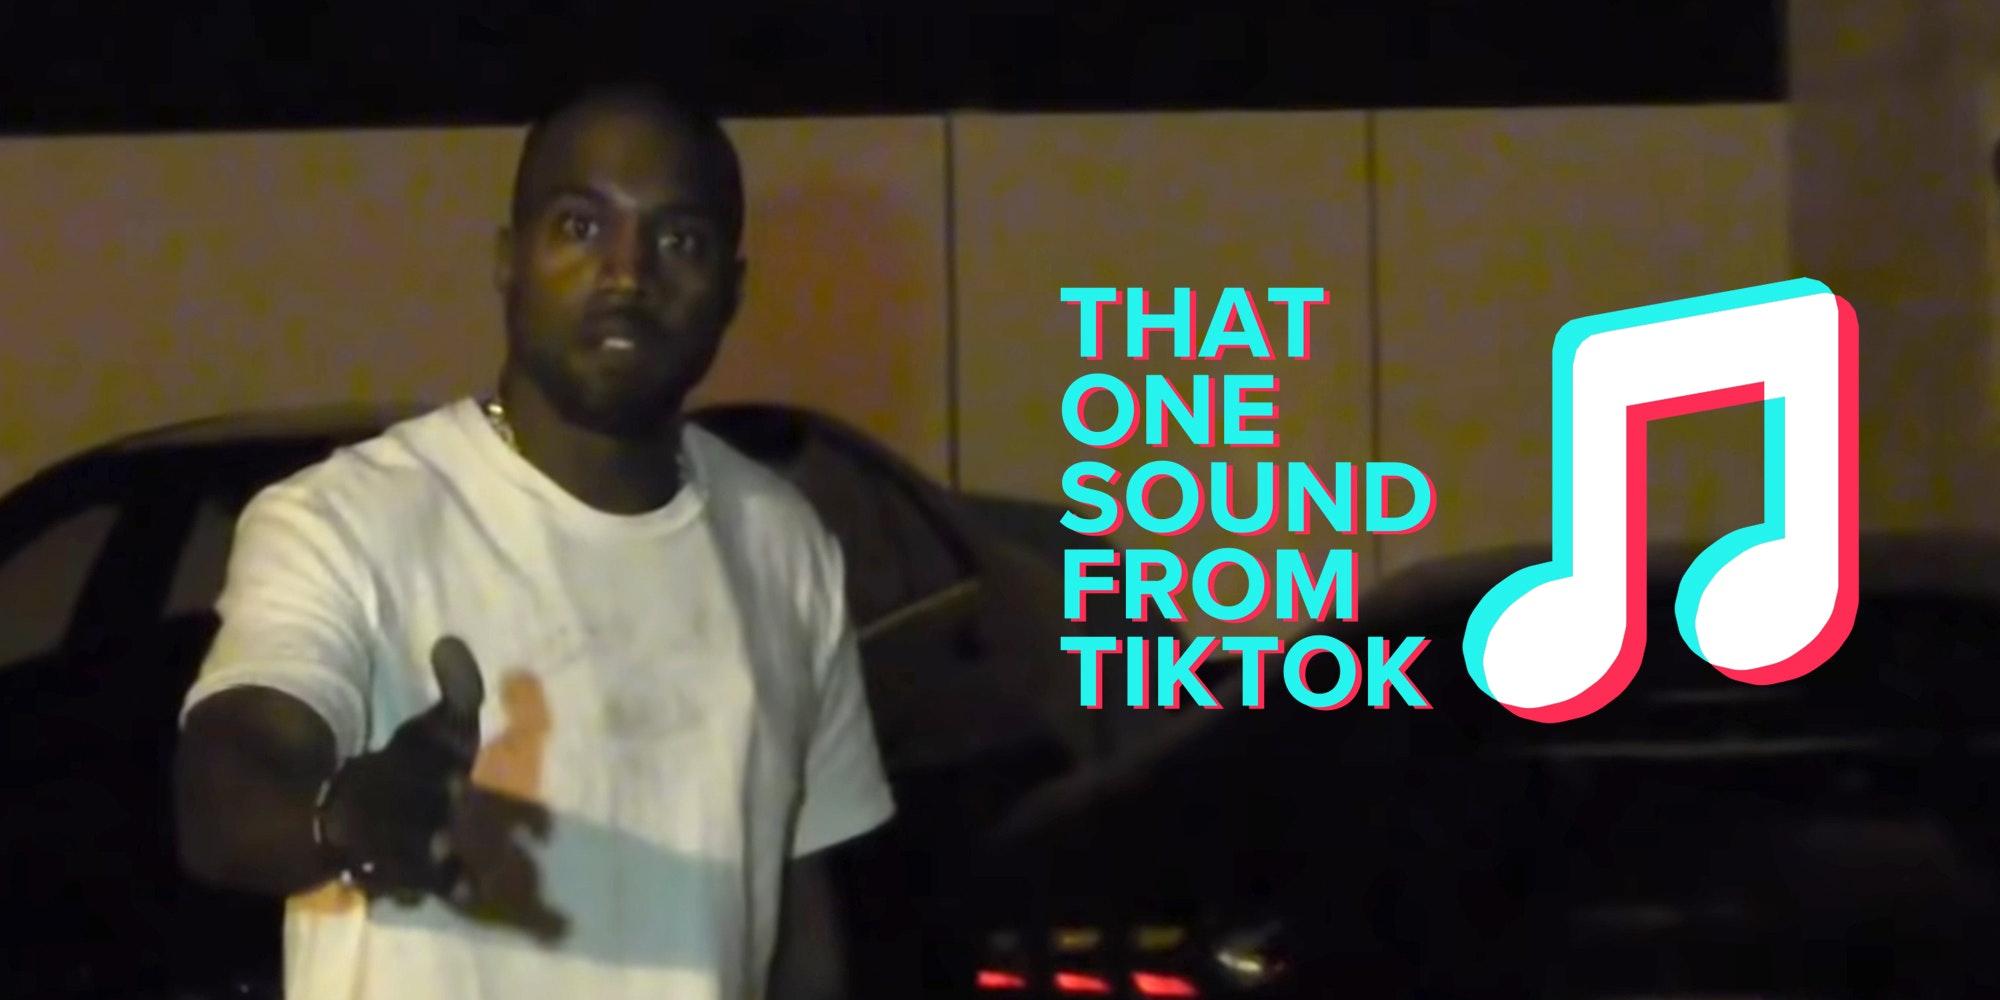 That One Sound The Origins Of Good Morning Kanye On Tiktok